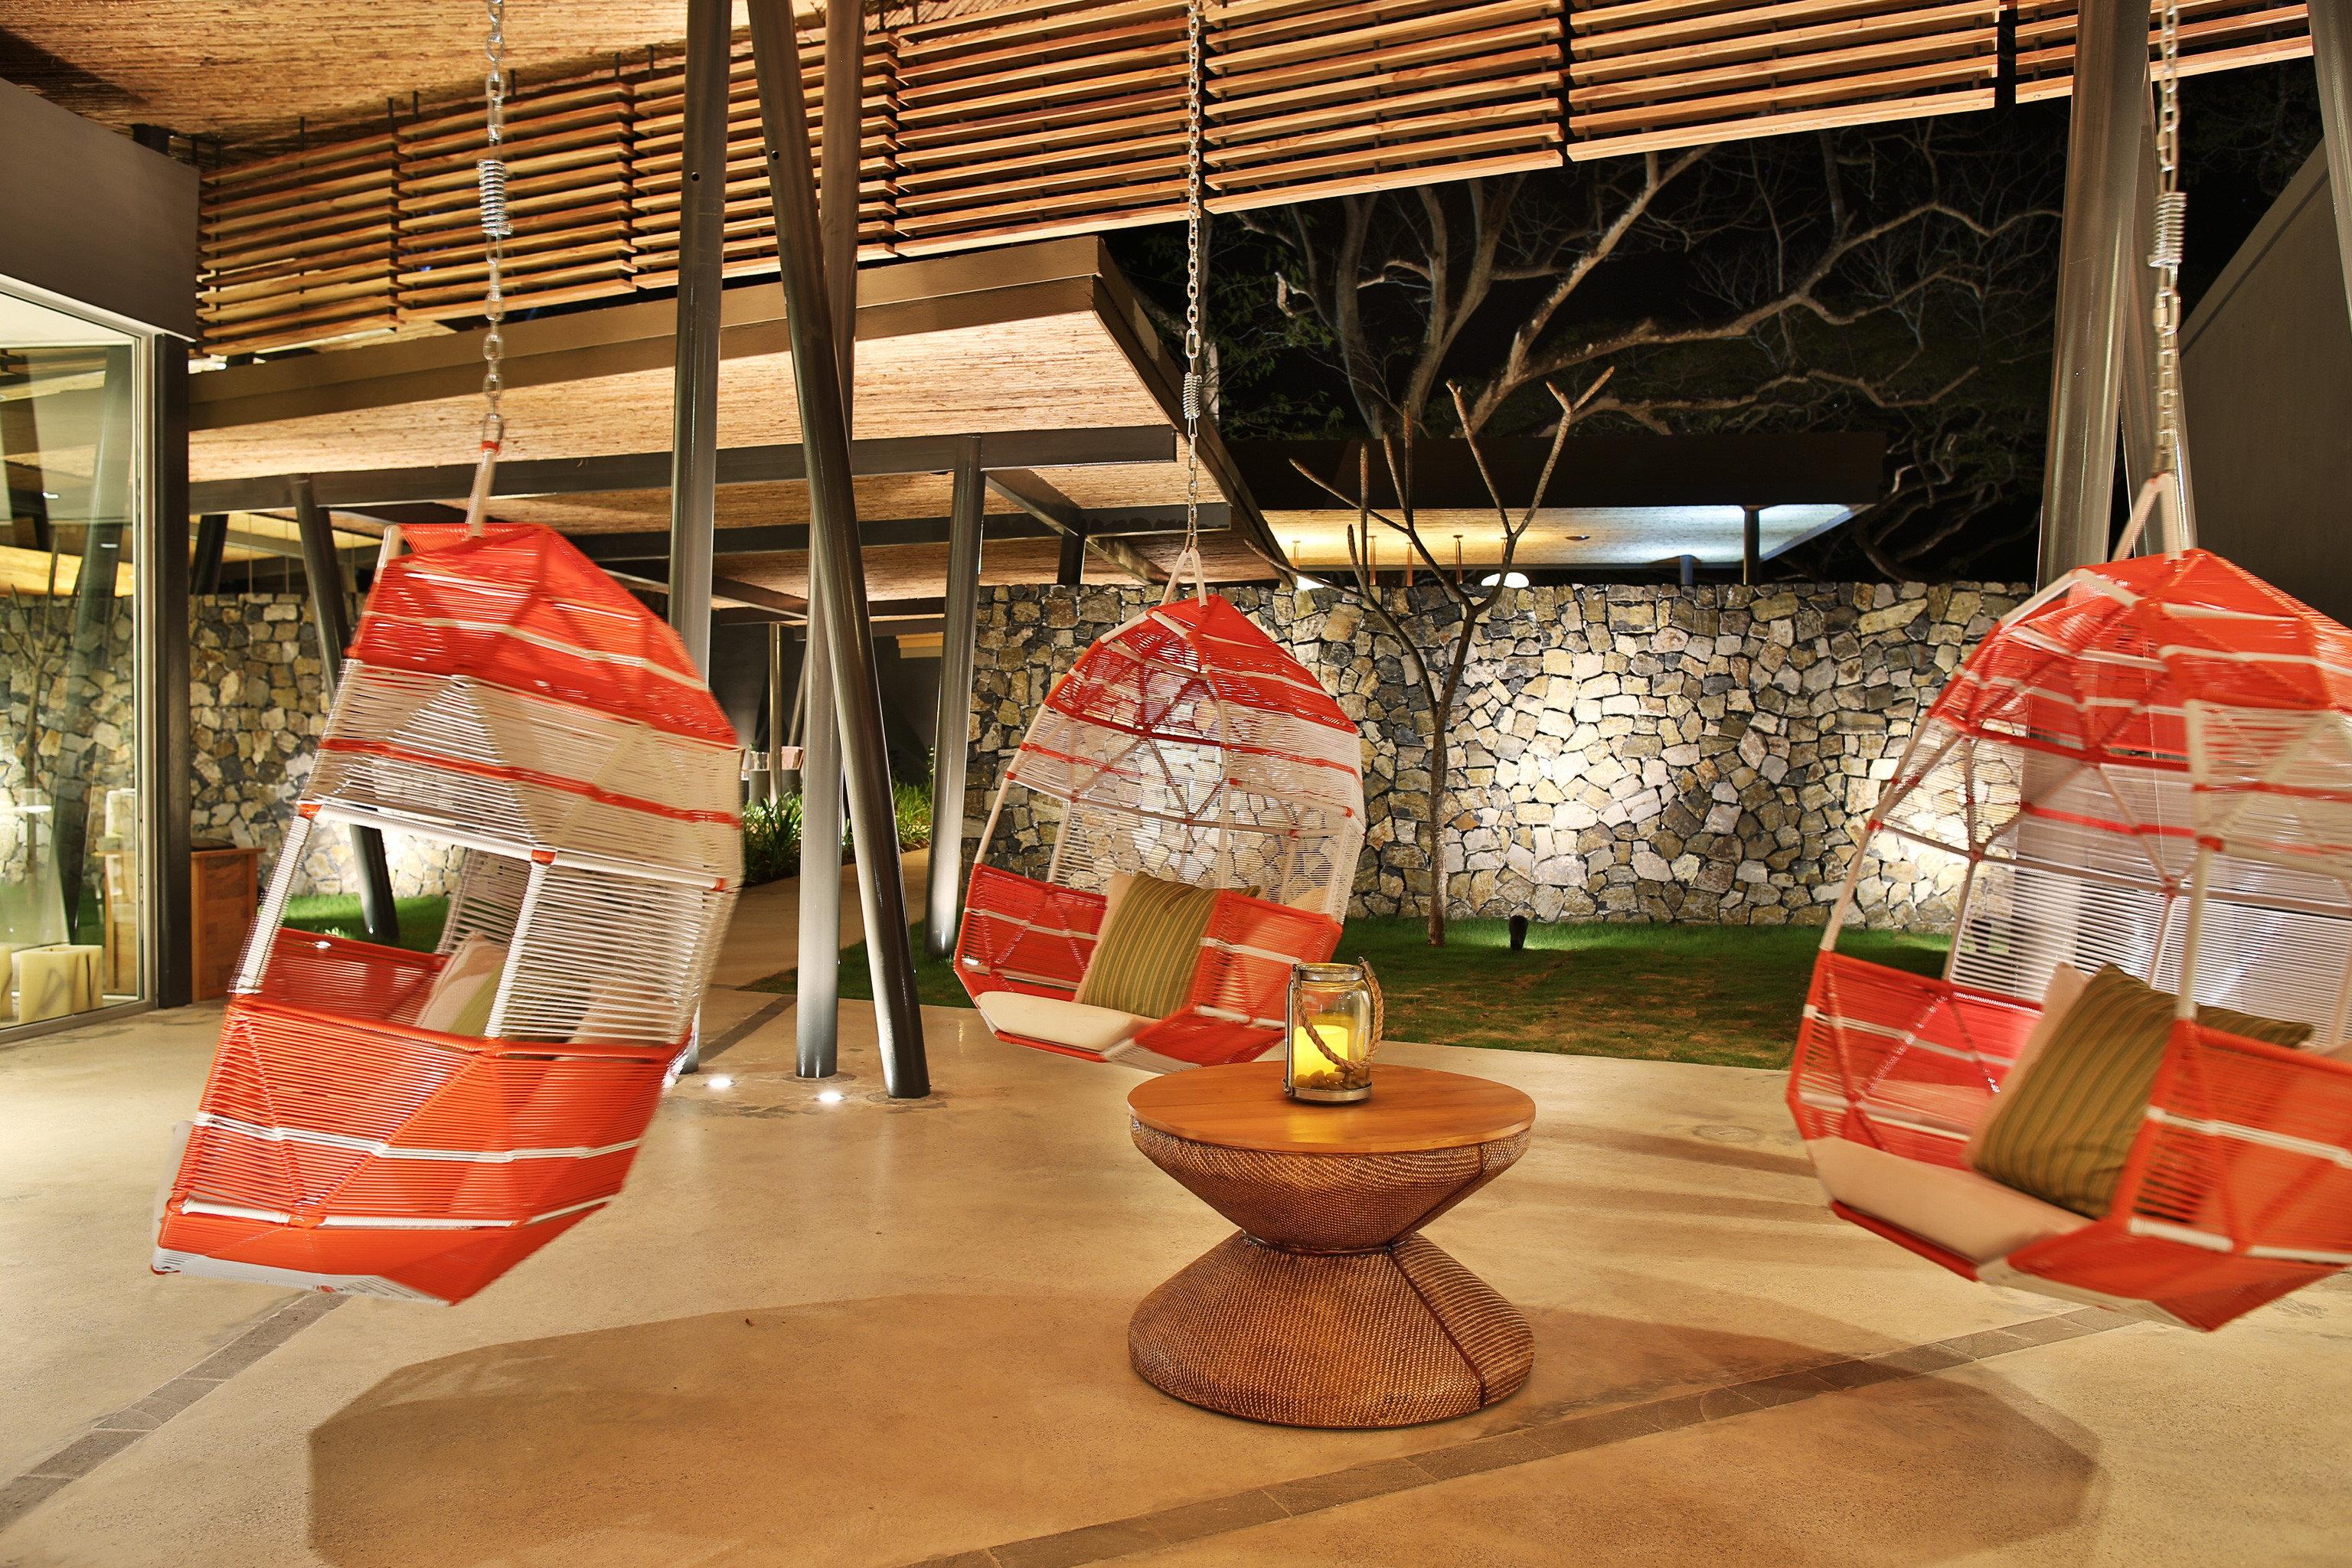 Beachfront Boutique Drink Elegant Hip Hotels Lounge Play Waterfront red interior design tourist attraction orange